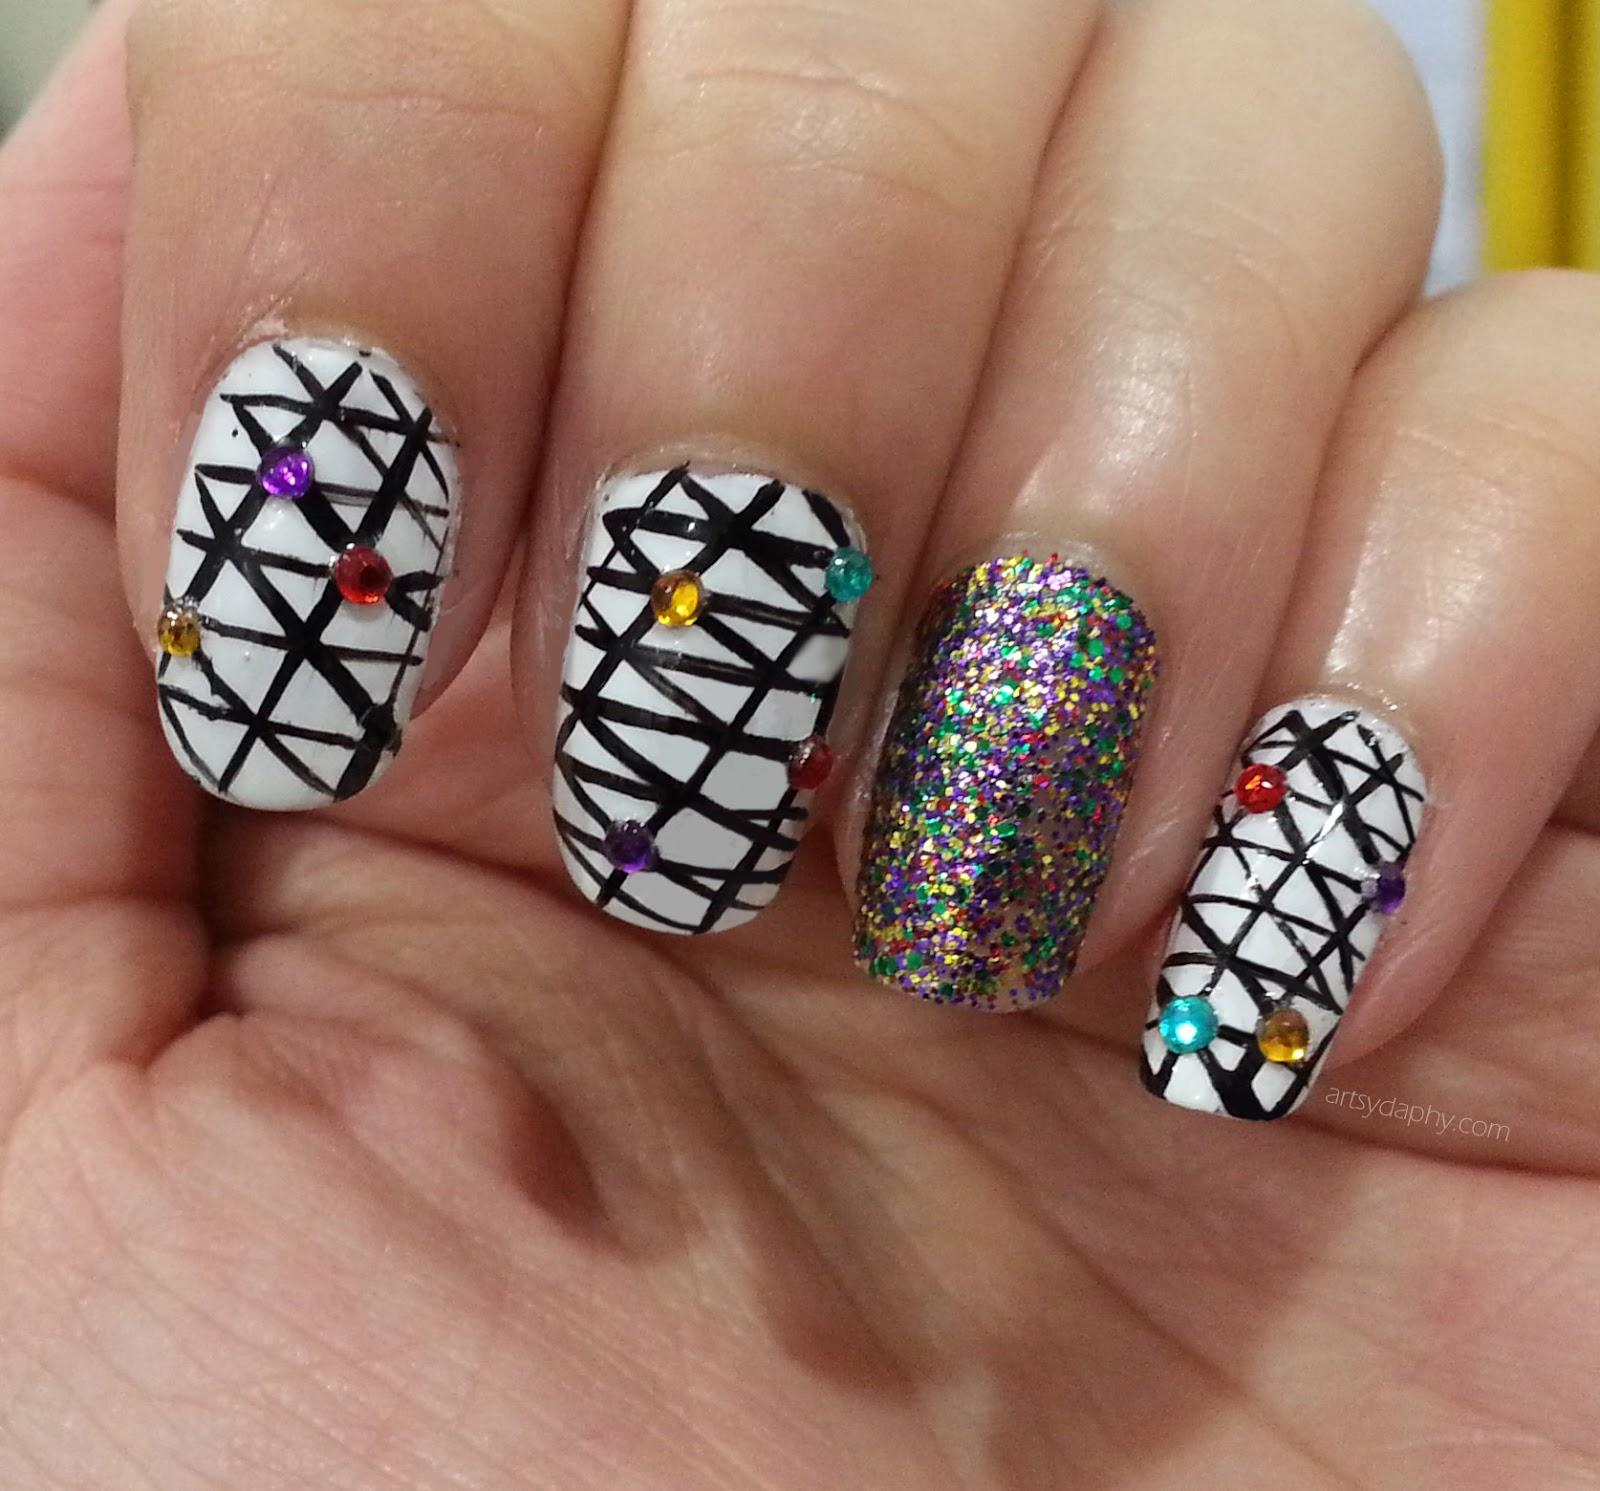 nail art Archives - ArtsyDaphy.com